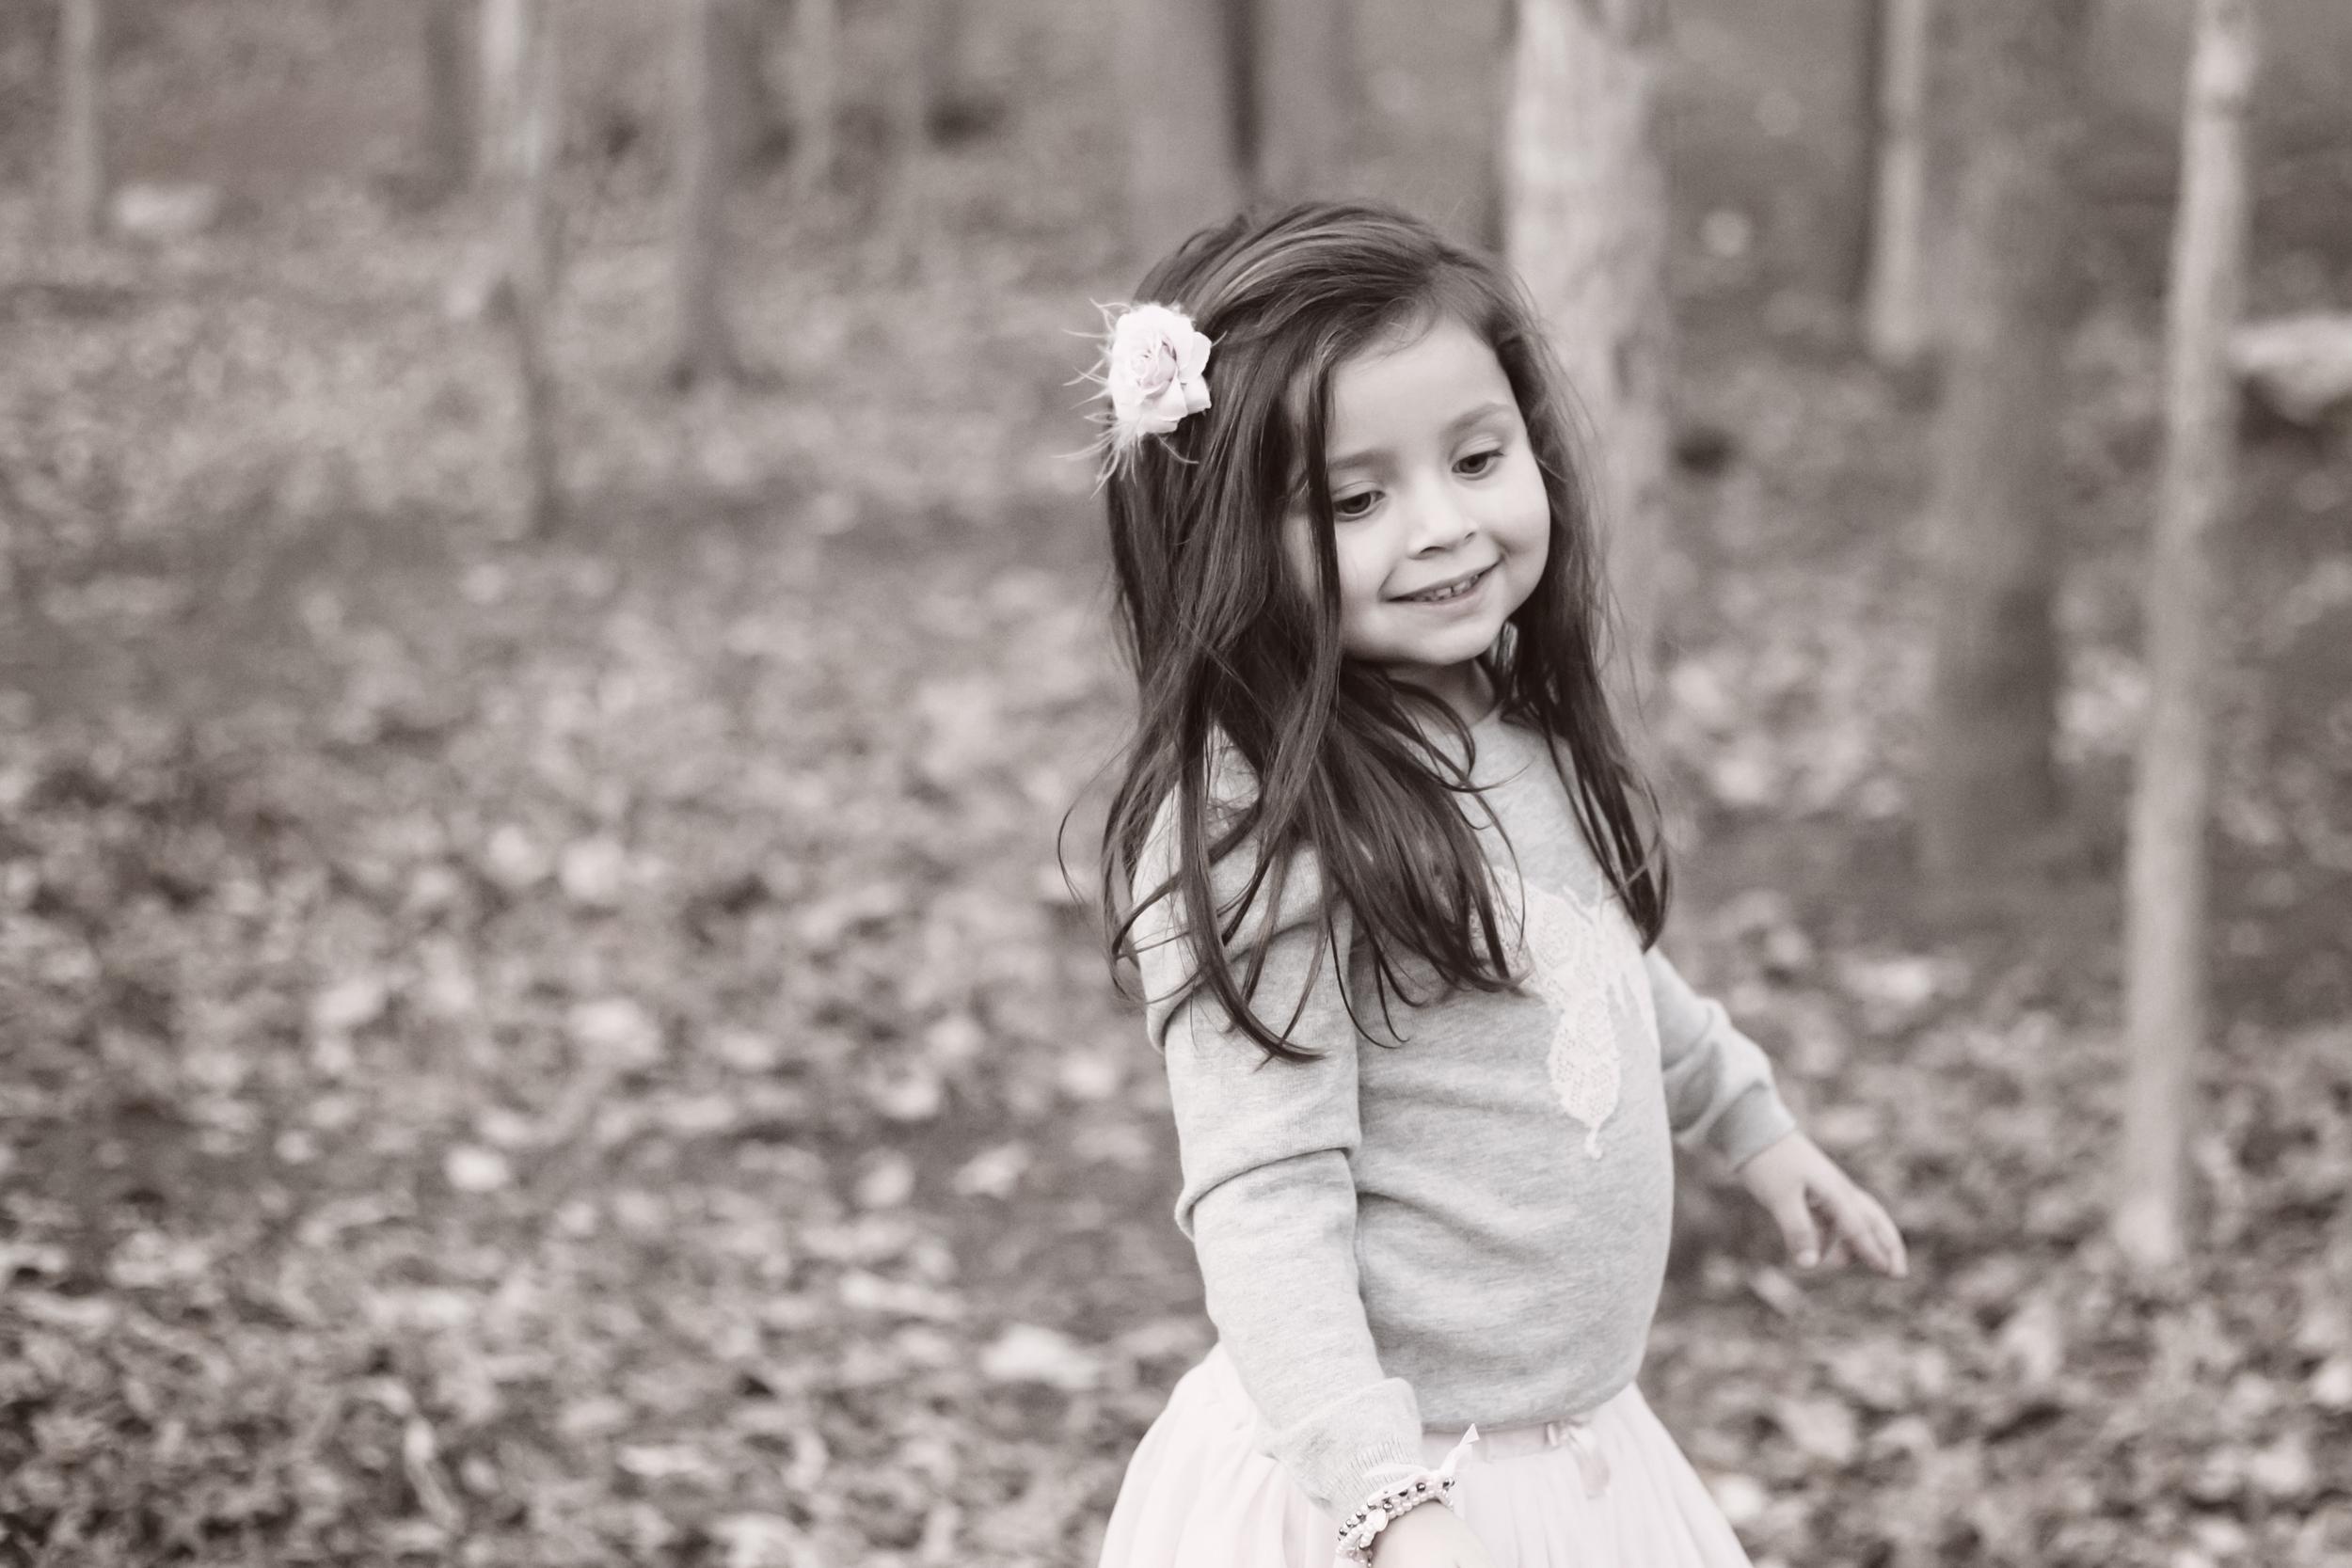 Eliana bw (kids:cover).jpg